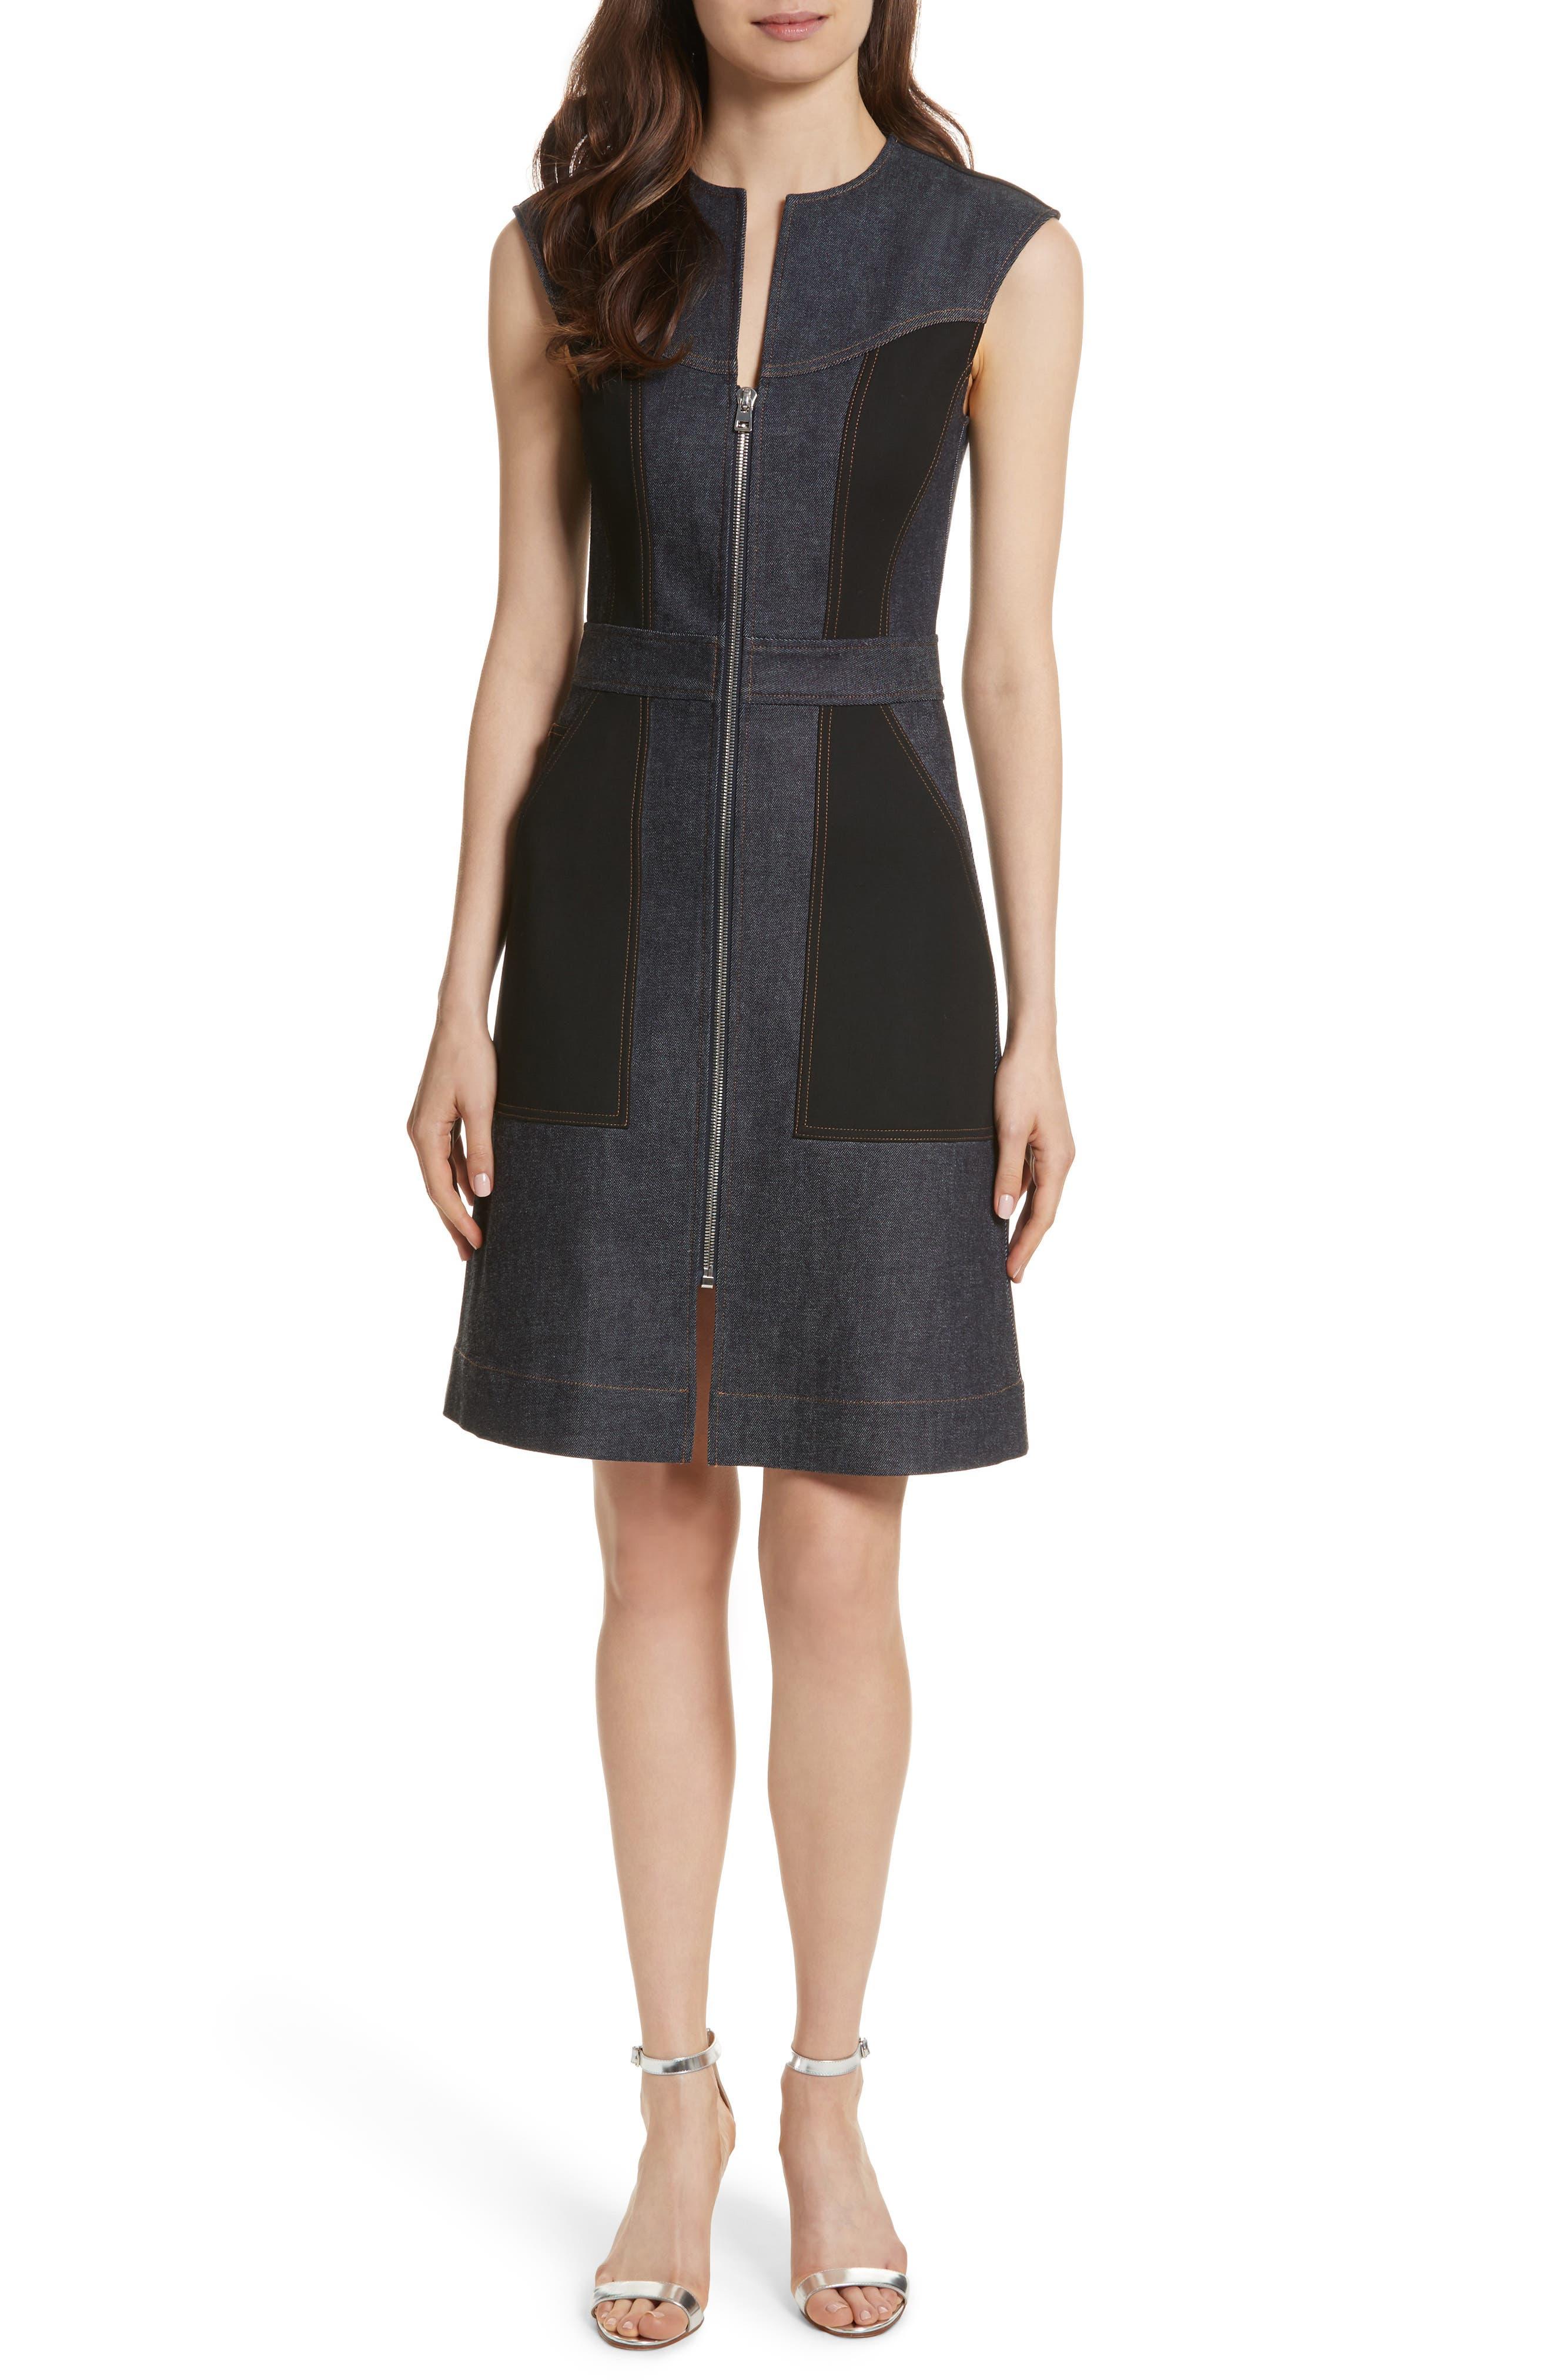 Diane von Furstenberg Front Zip Denim Dress,                             Main thumbnail 1, color,                             Indigo/ Black